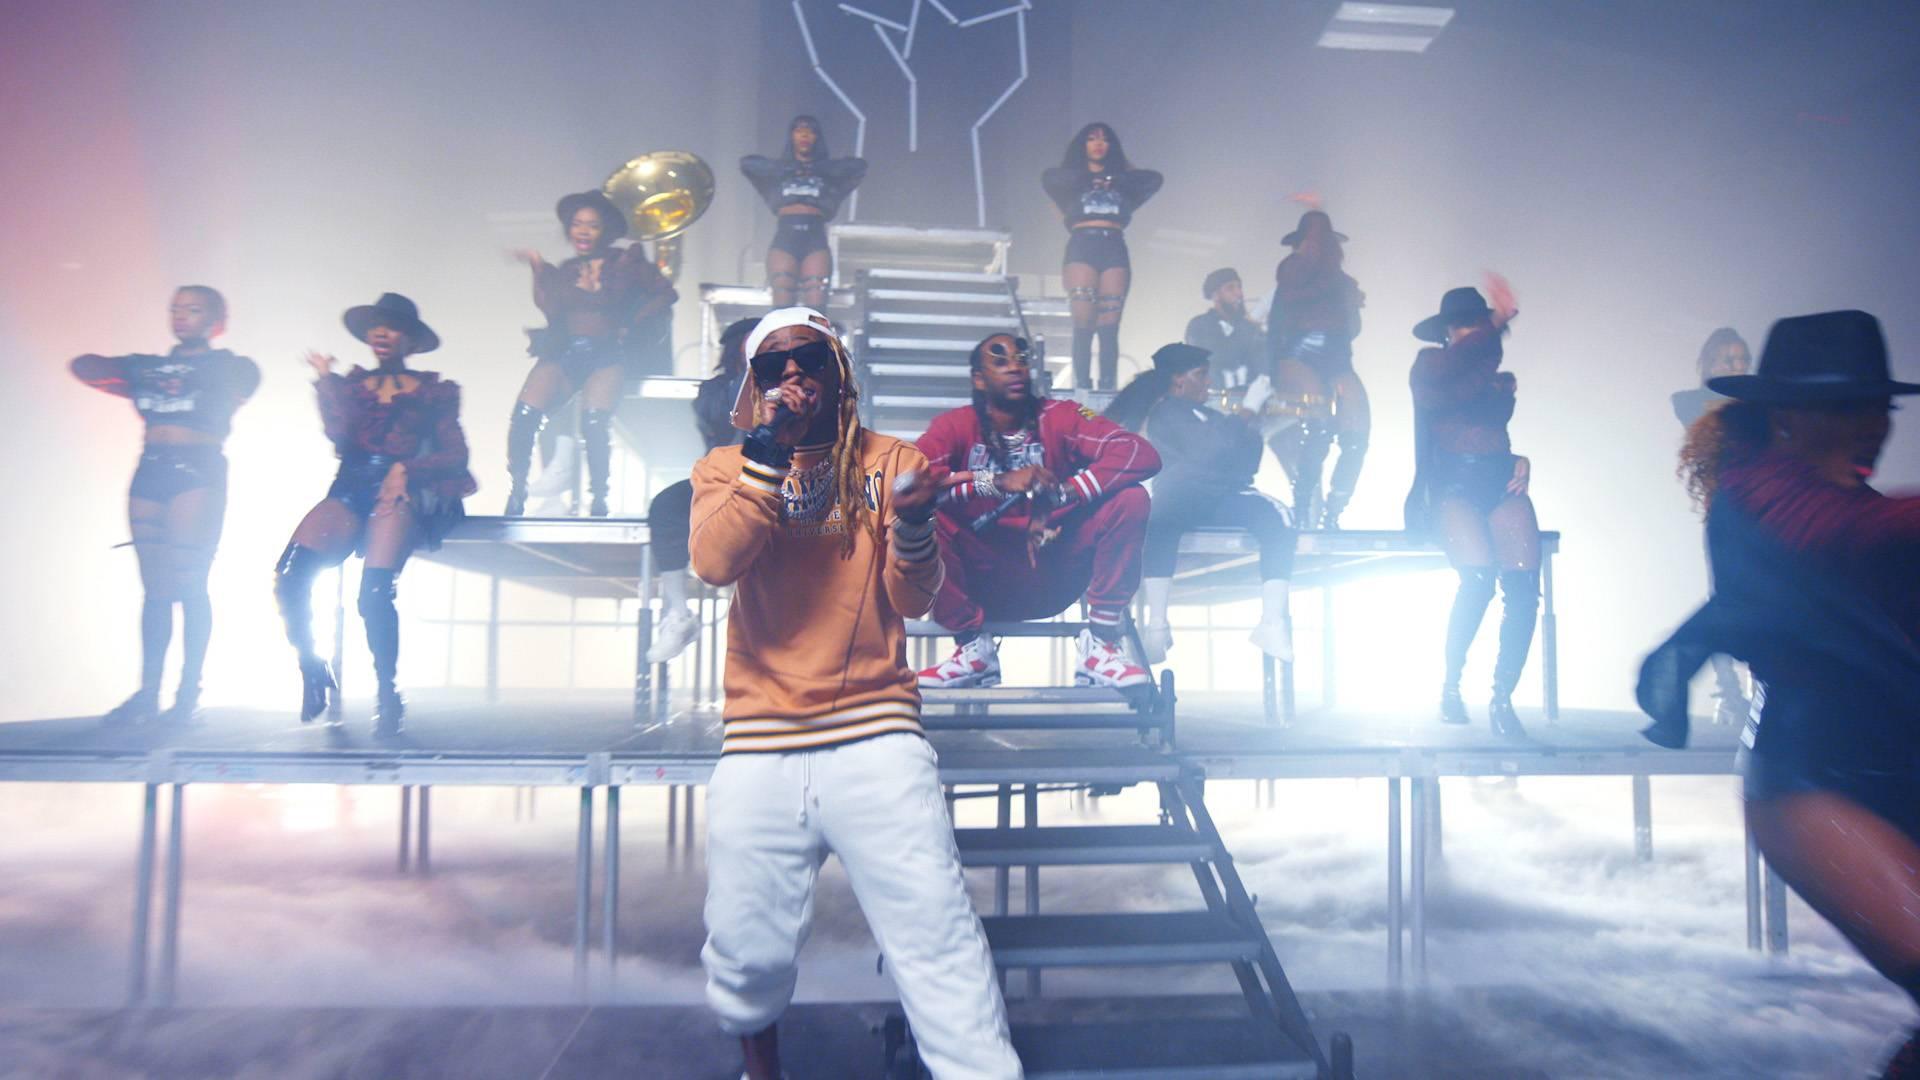 Hip Hop Awards 2020 | Show Highlights Gallery Lil Wayne | 1920x1080